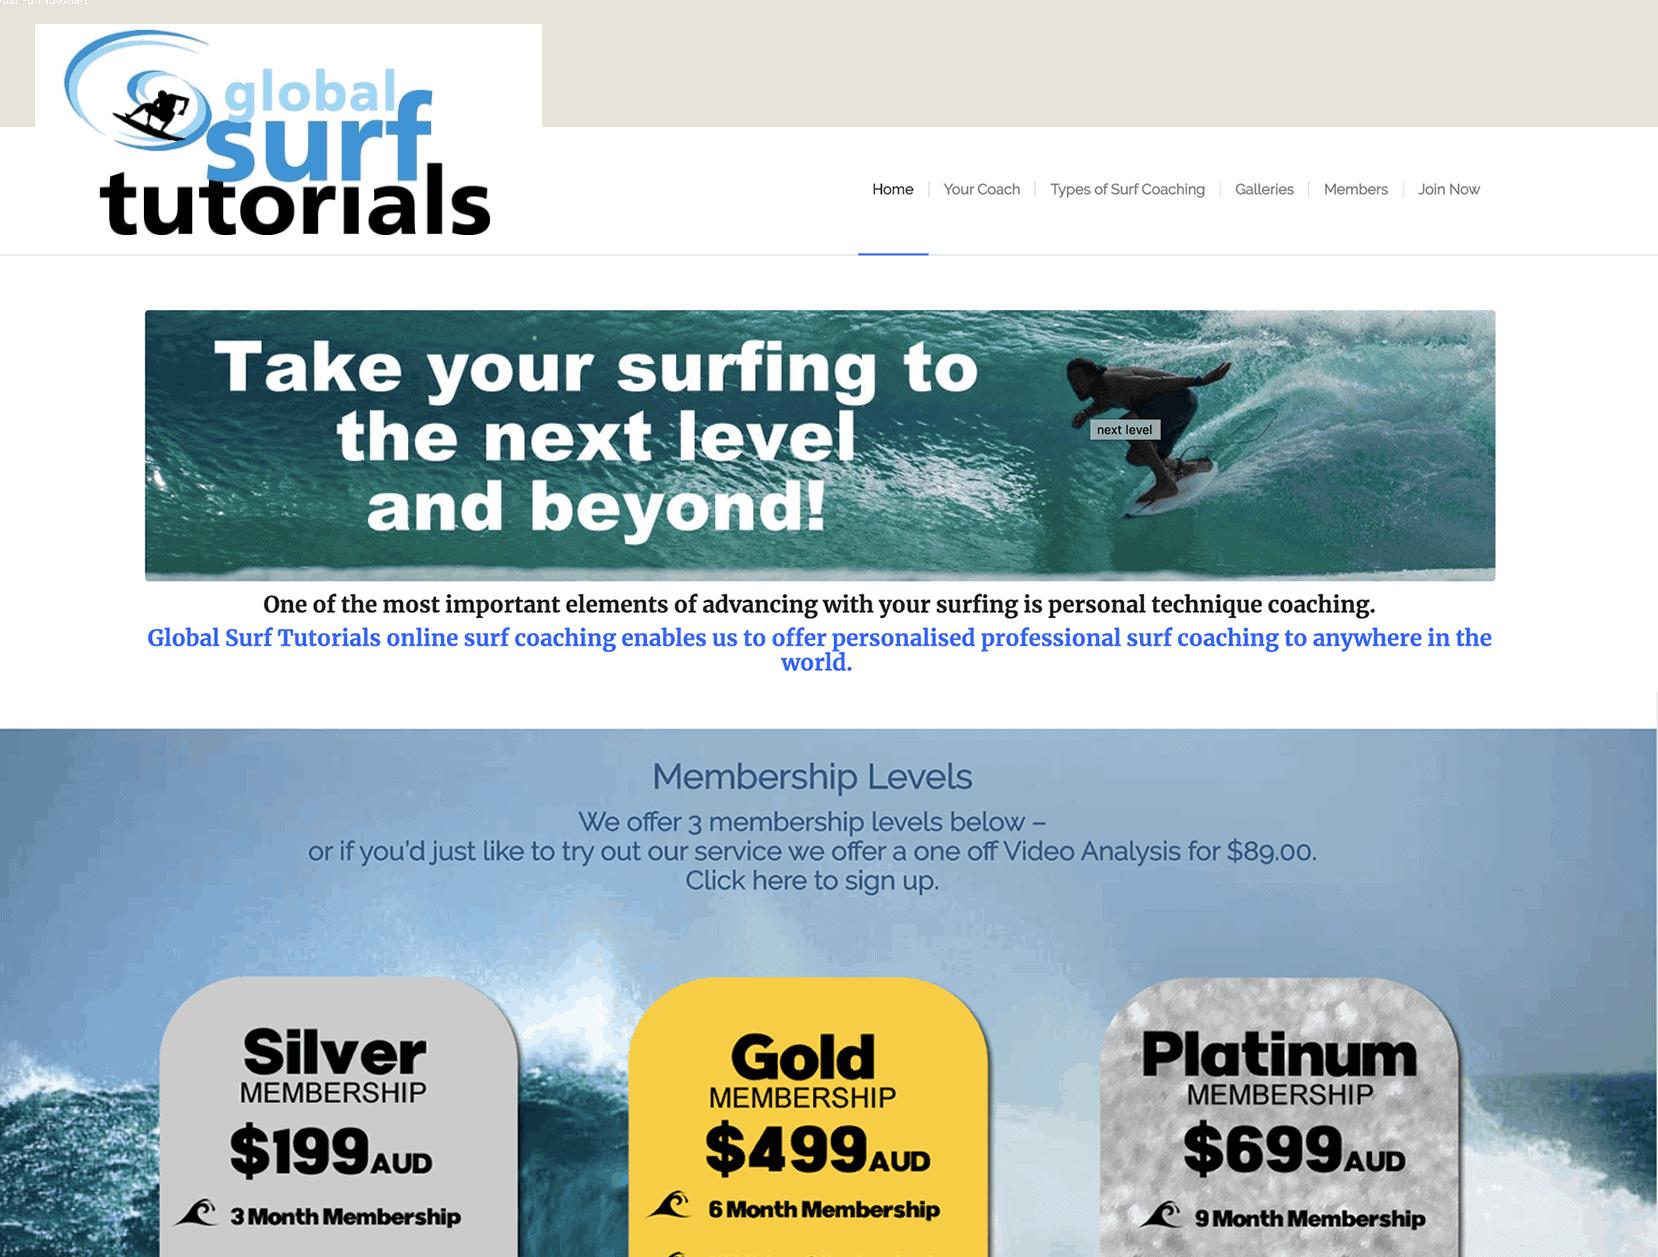 Global Surf Tutorials